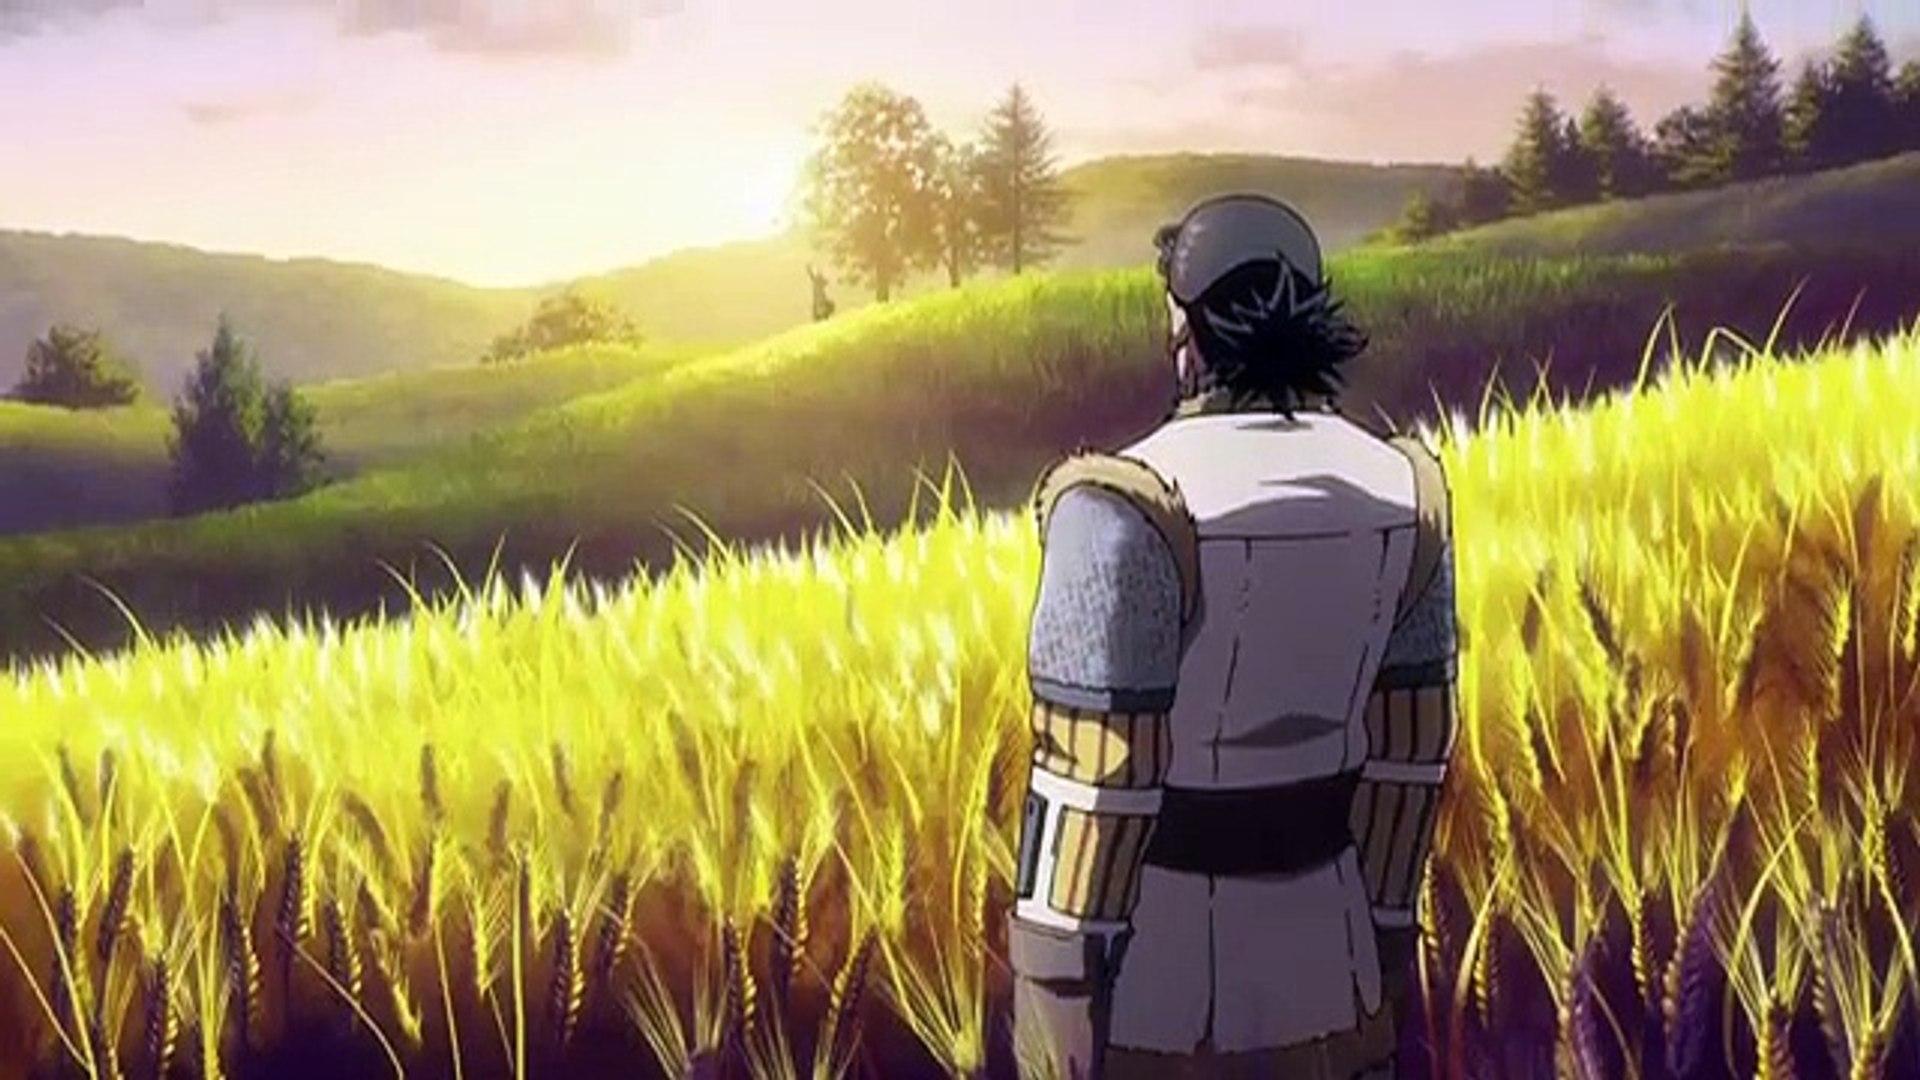 Angel O Demonio S01E01 Cda vinland saga ep 1 vostfr - dowload anime wallpaper hd